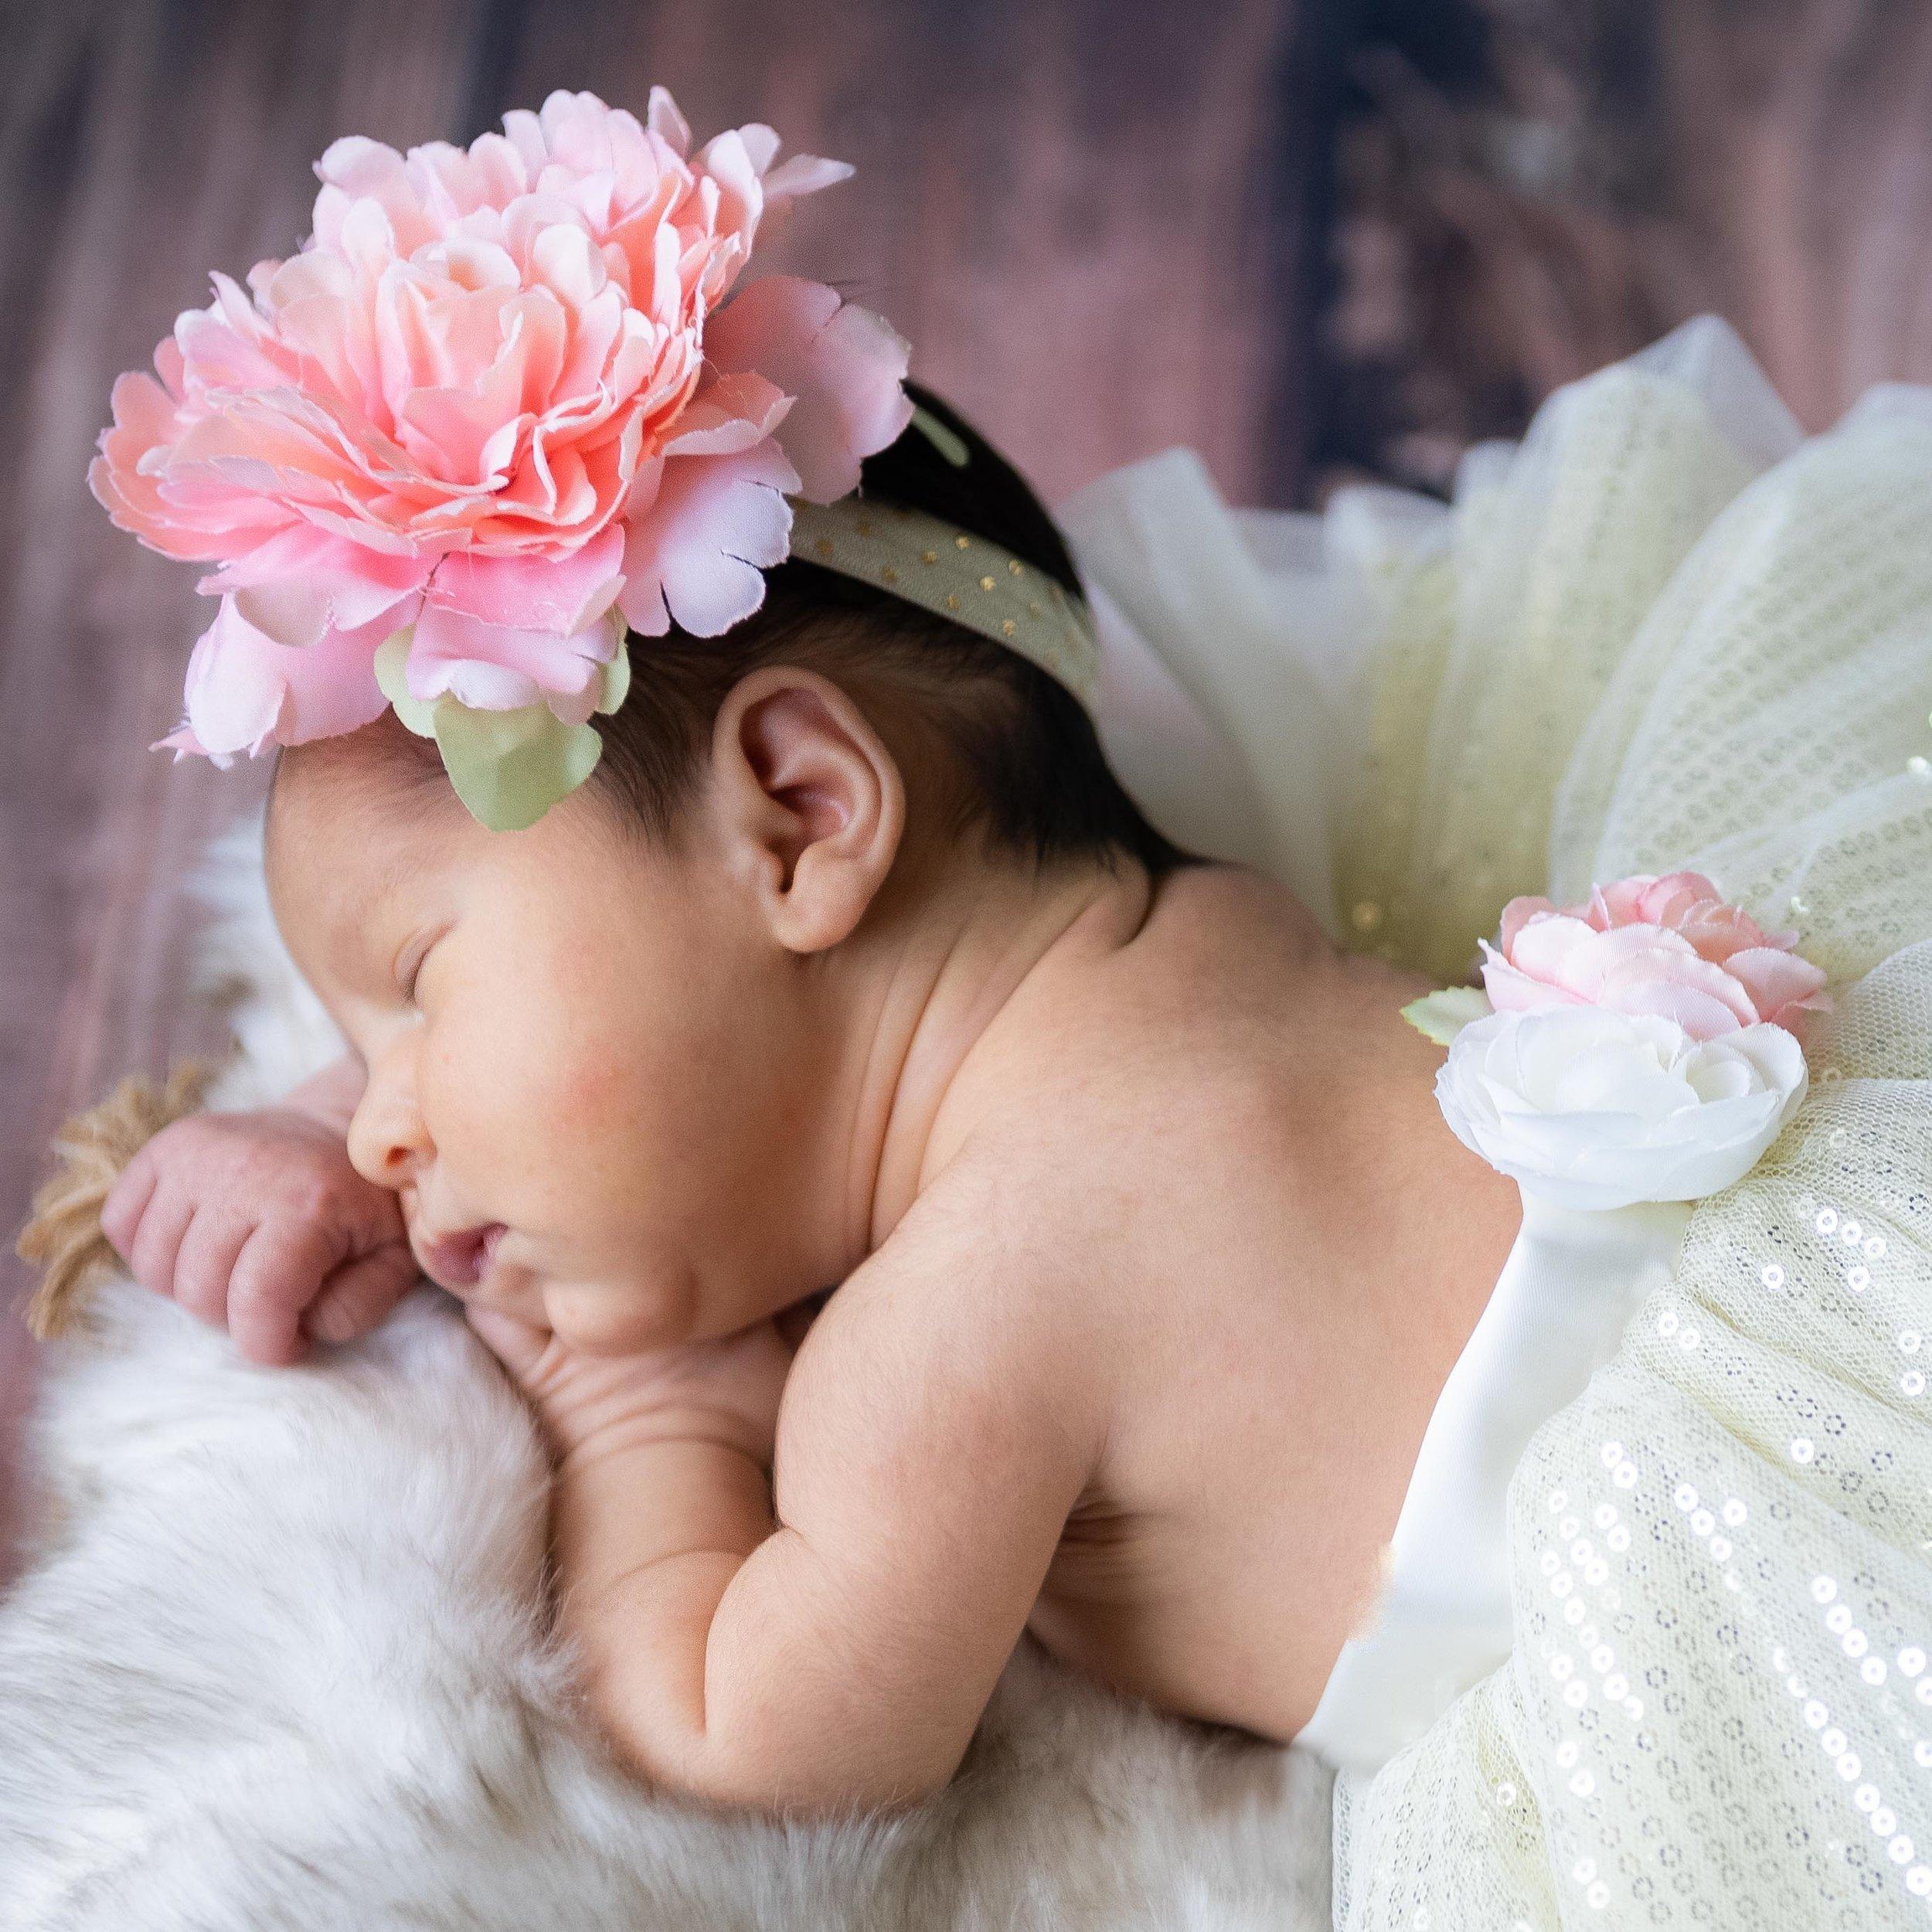 newborn girl 6 days old